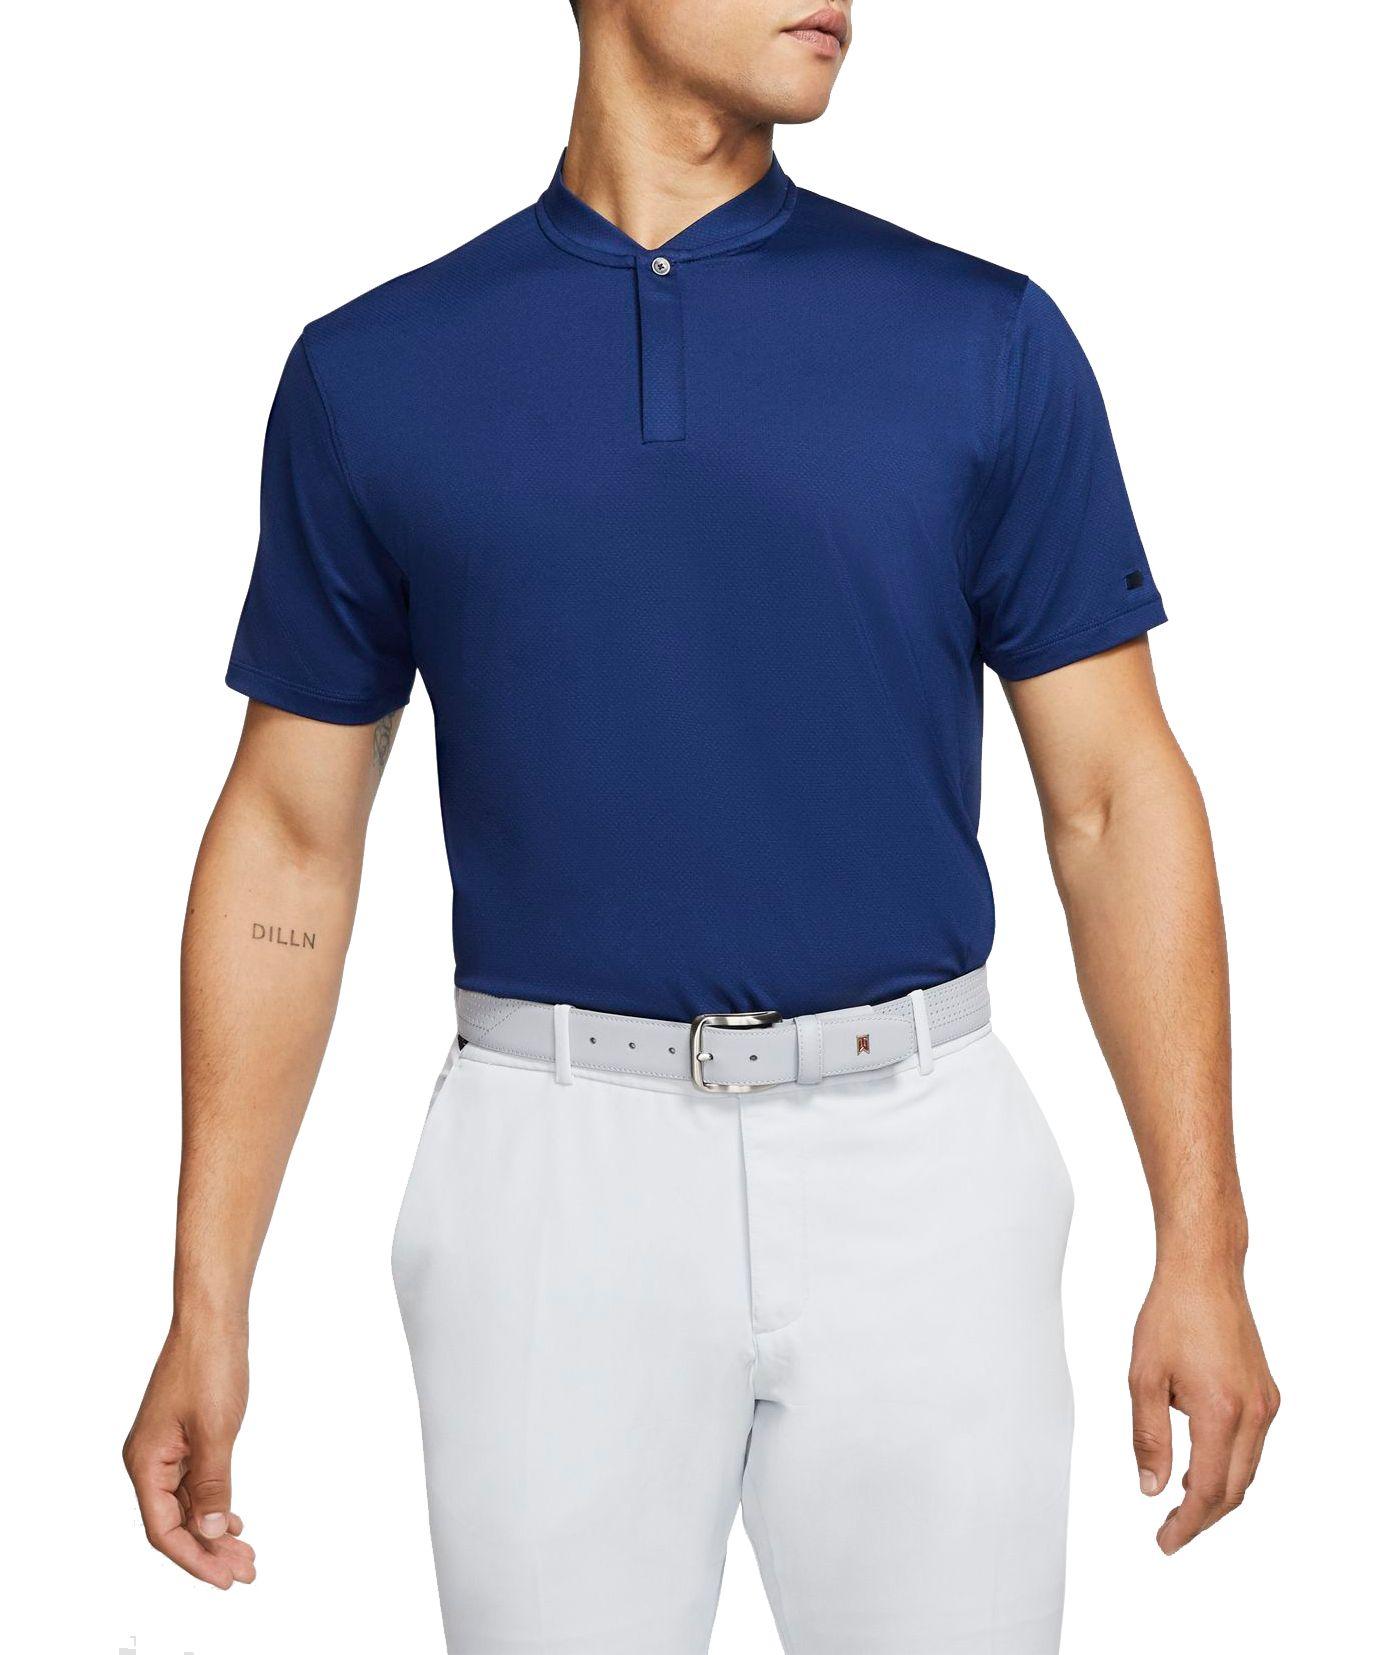 Nike Men's Tiger Woods Blade Collar Golf Polo